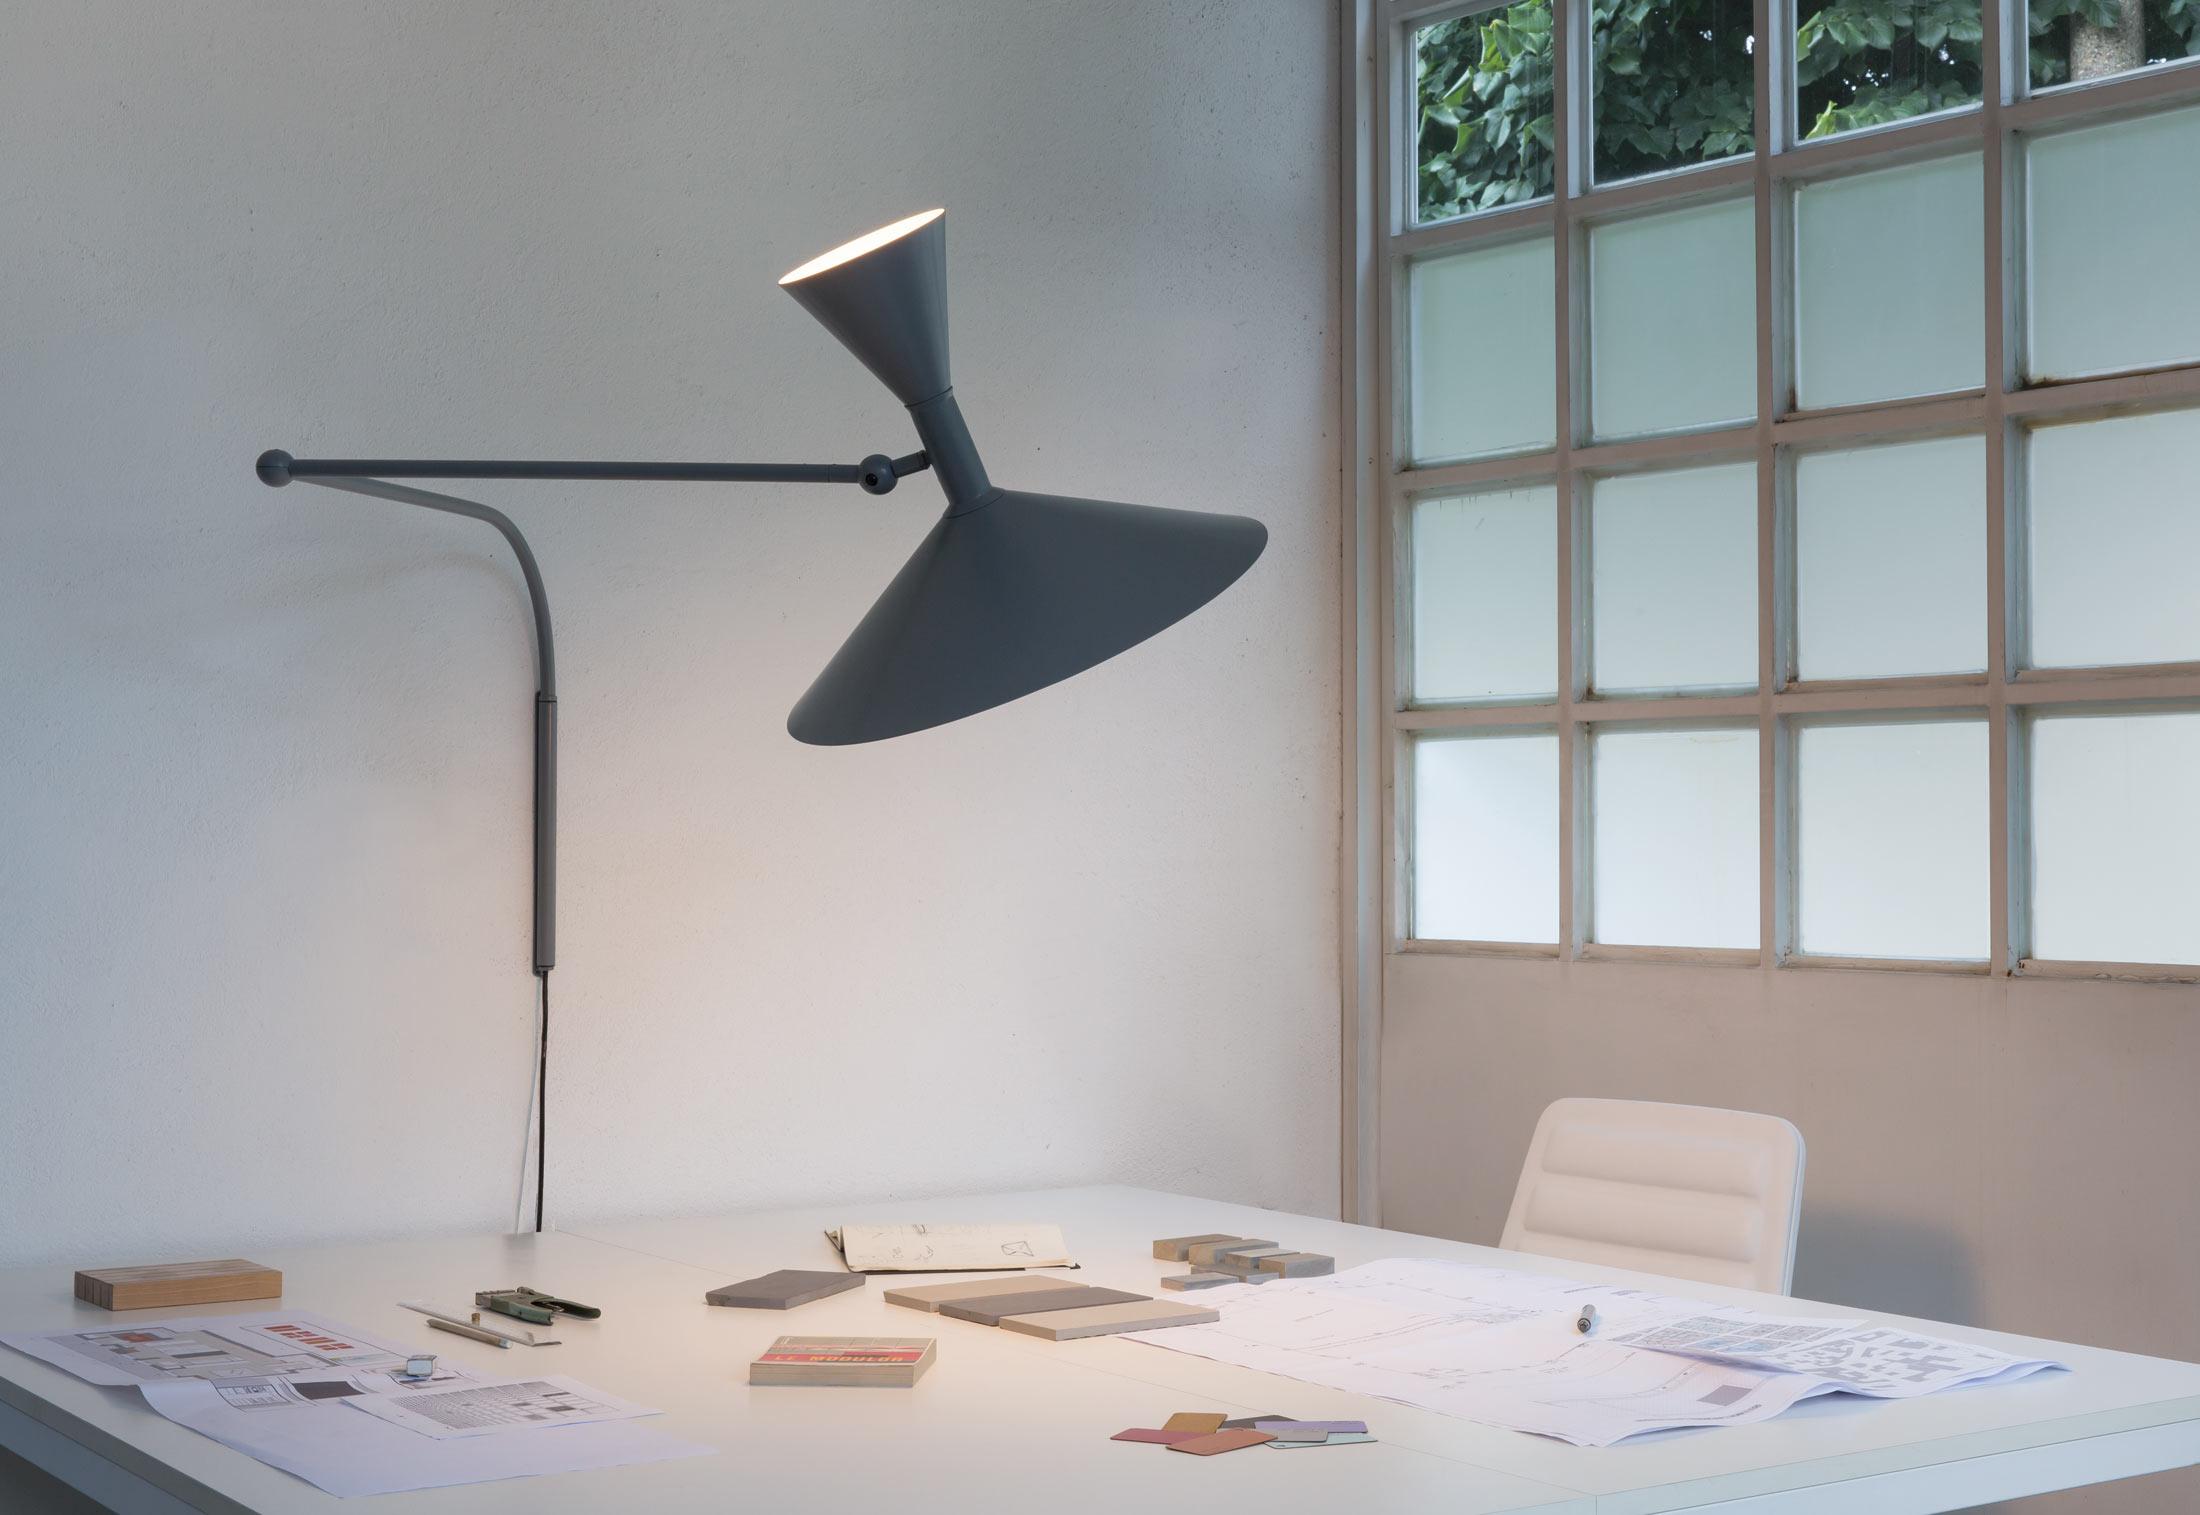 lampe-de-marseille-3 Spannende Lampen Frankfurt Am Main Dekorationen